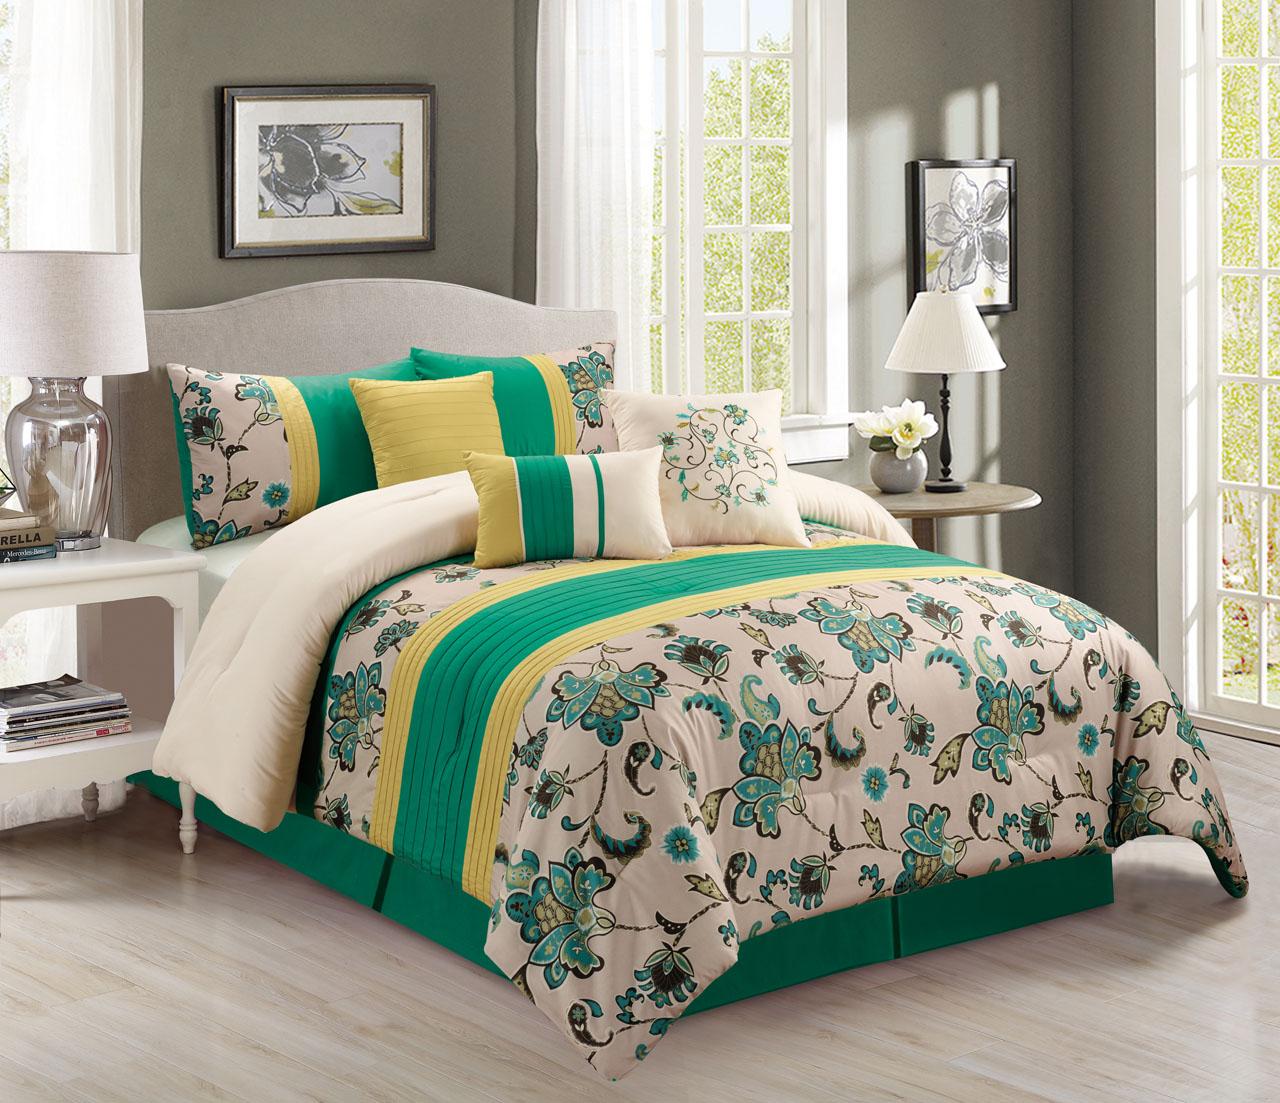 KingLinen 11 Piece Green/Beige/Yellow Floral Bed in a Bag w/500TC Cotton Sheet Set